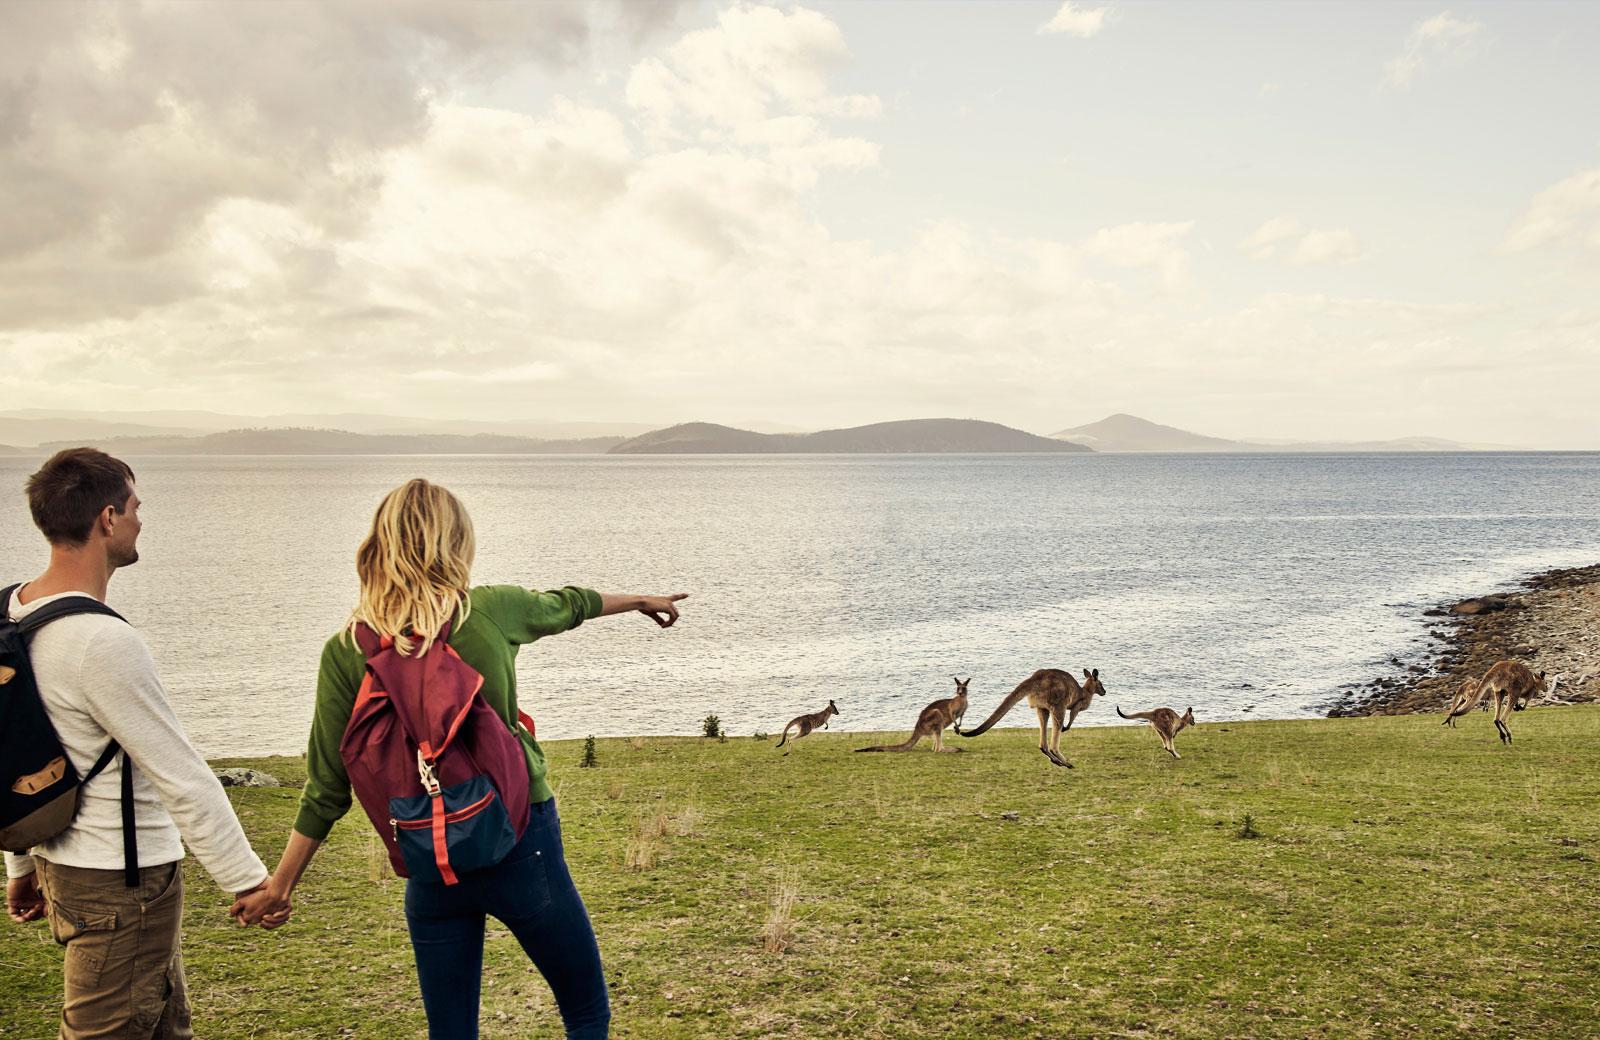 locum tenens in Australia looking at kangaroos